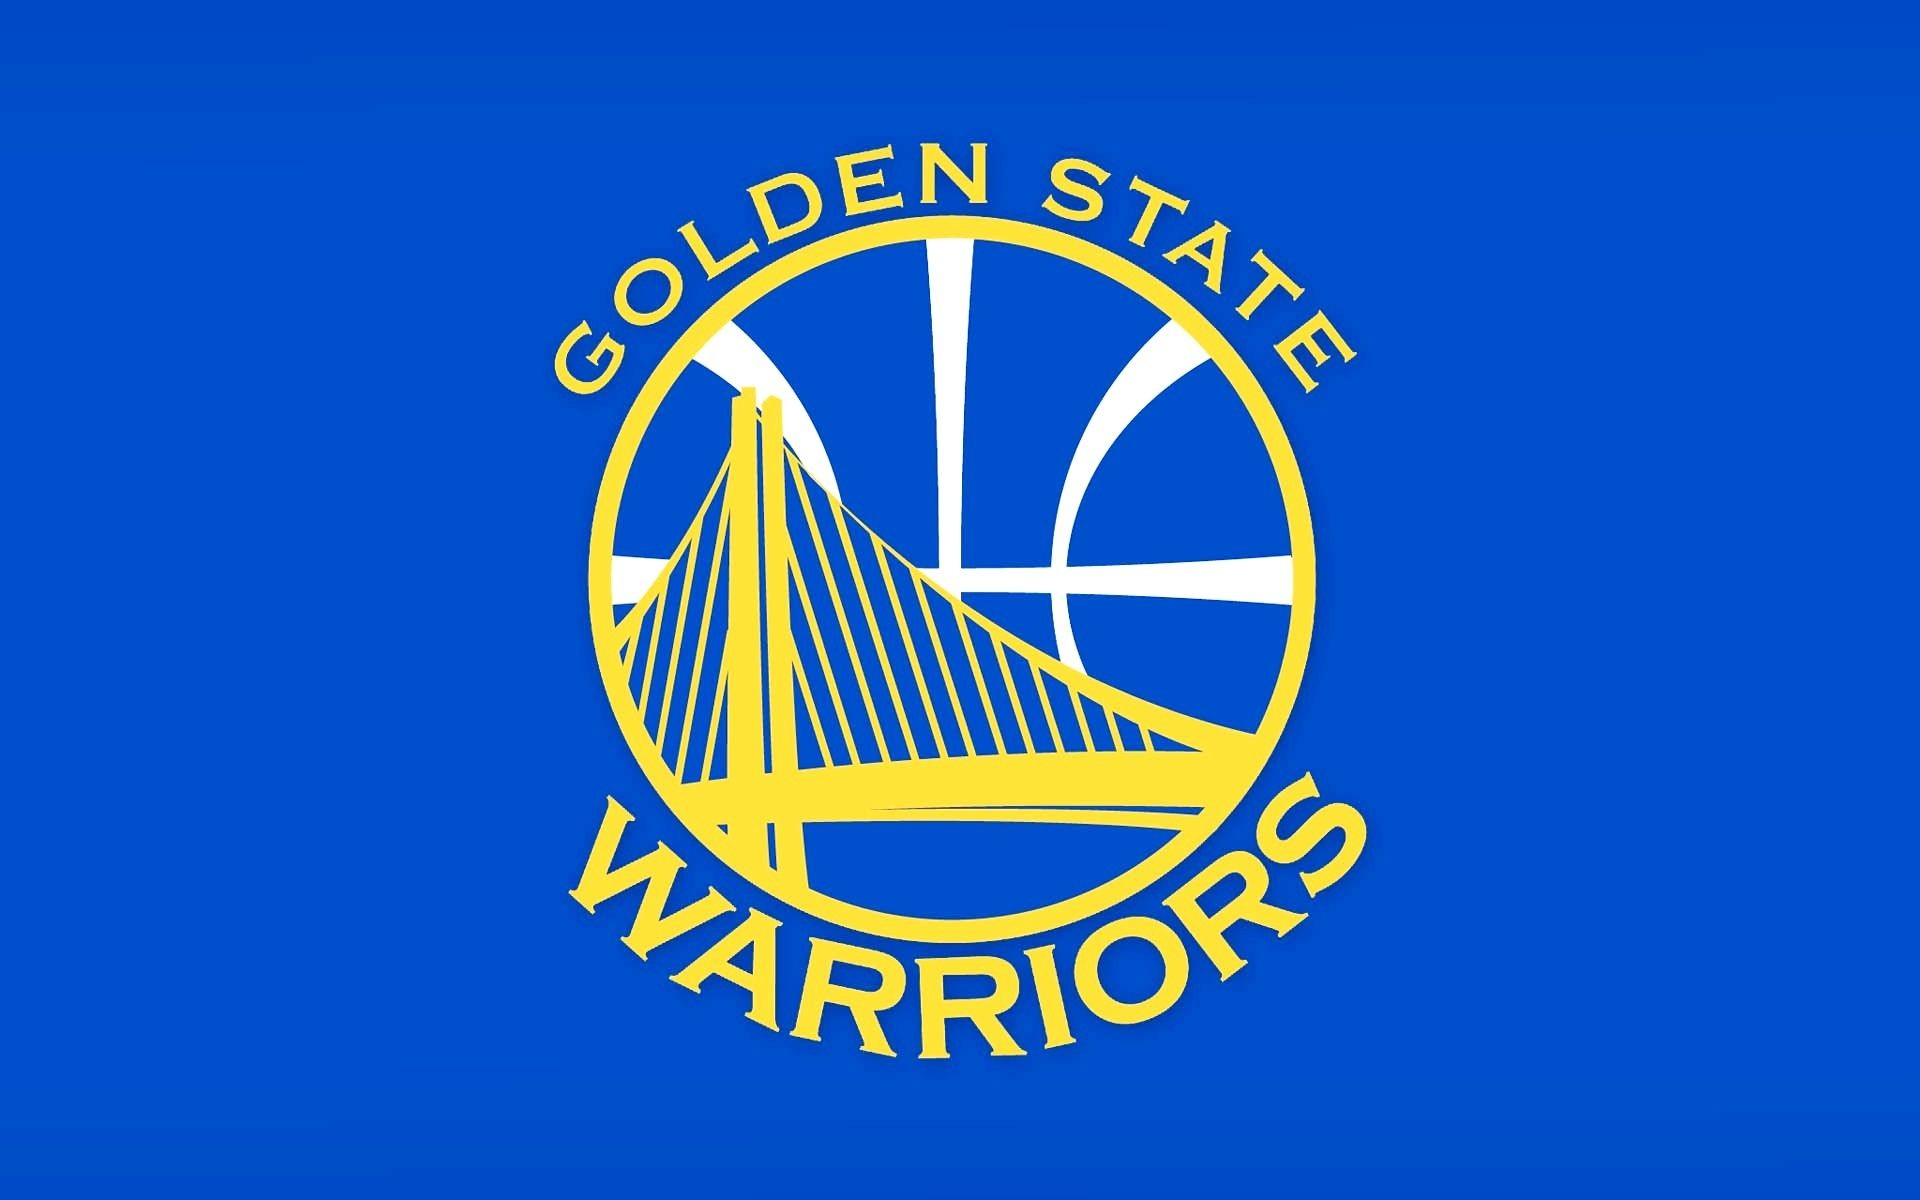 Basketball Wallpaper Iphone Nba Team Logos Wallpaper 183 ①